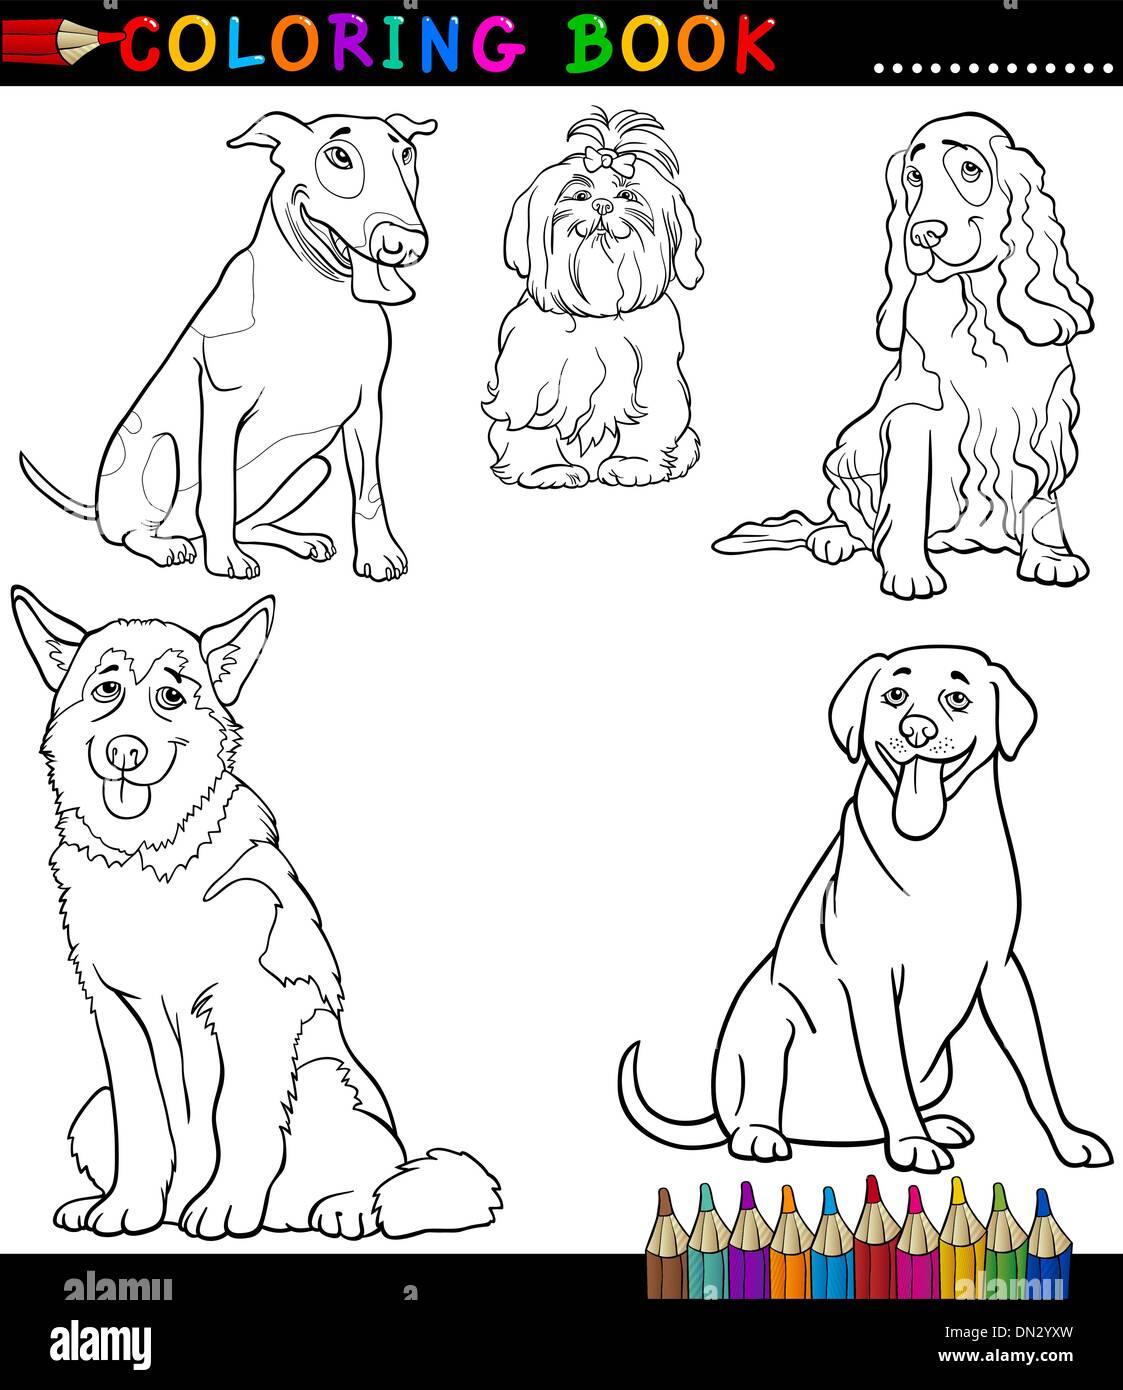 Comic-Hunde oder Welpen Malvorlagen Vektor Abbildung - Bild ...